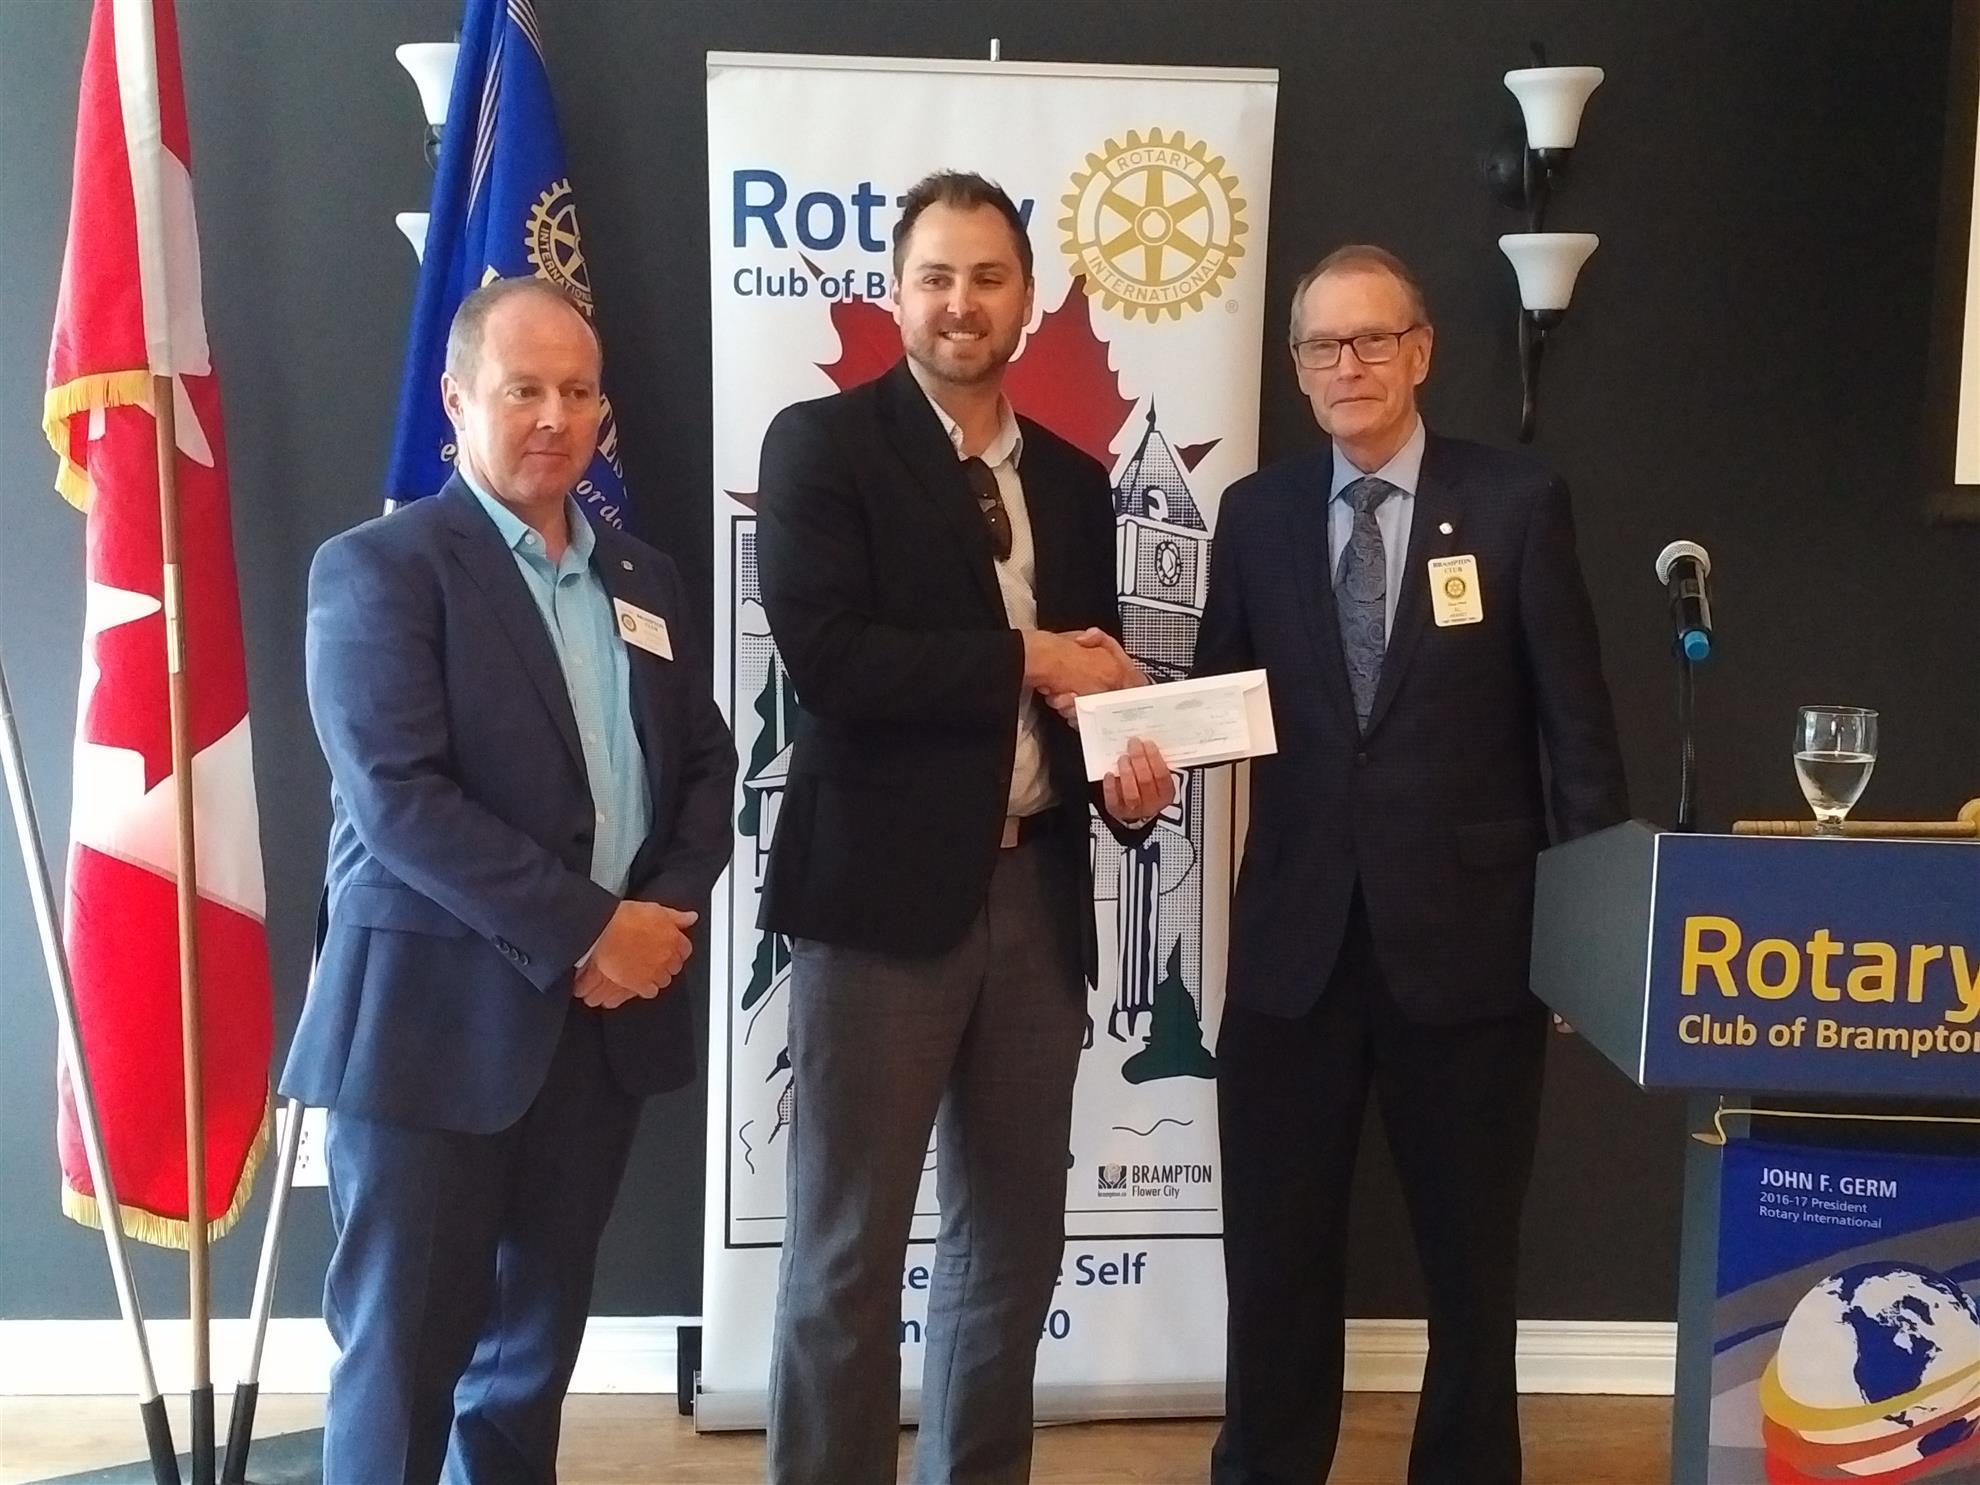 Stories | Rotary Club of Brampton